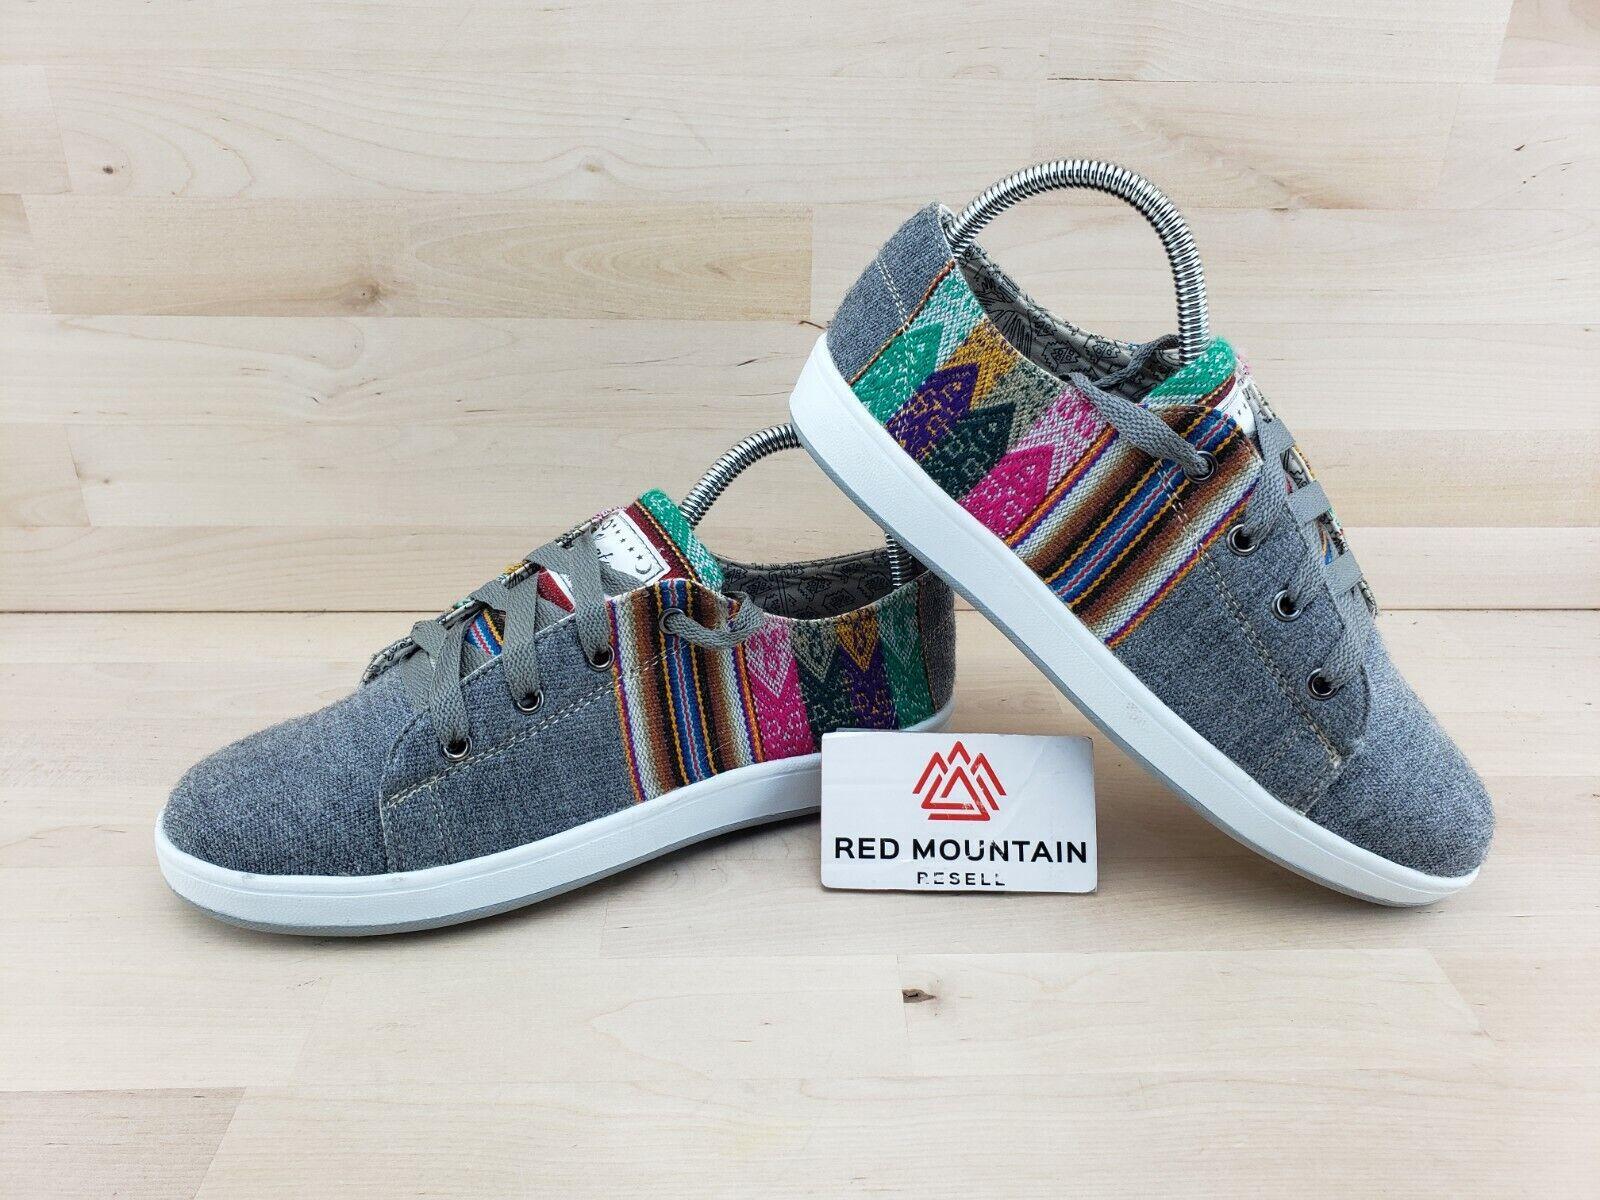 Katay's Fair Trade Peruvian Sneakers Authentic Textiles - Women's Size 9.5 - 10